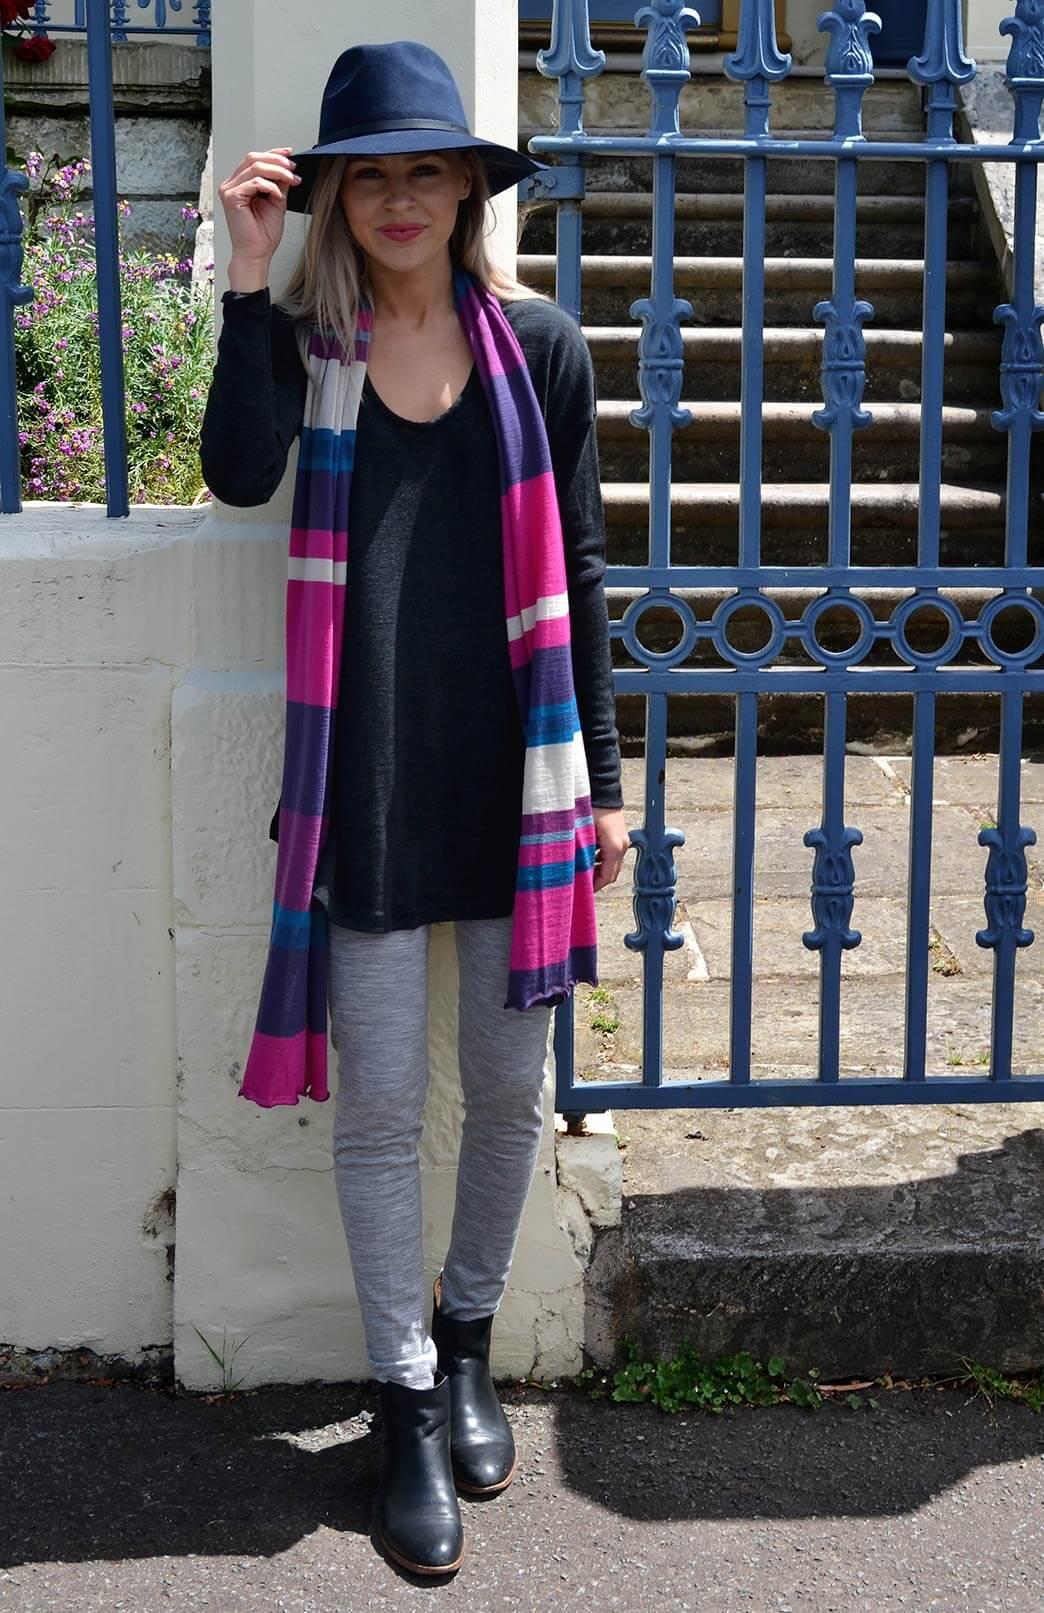 Scarves - Multi Striped - Women's Grape Purple and Pink Multi Striped Wide Wool Scarf - Smitten Merino Tasmania Australia